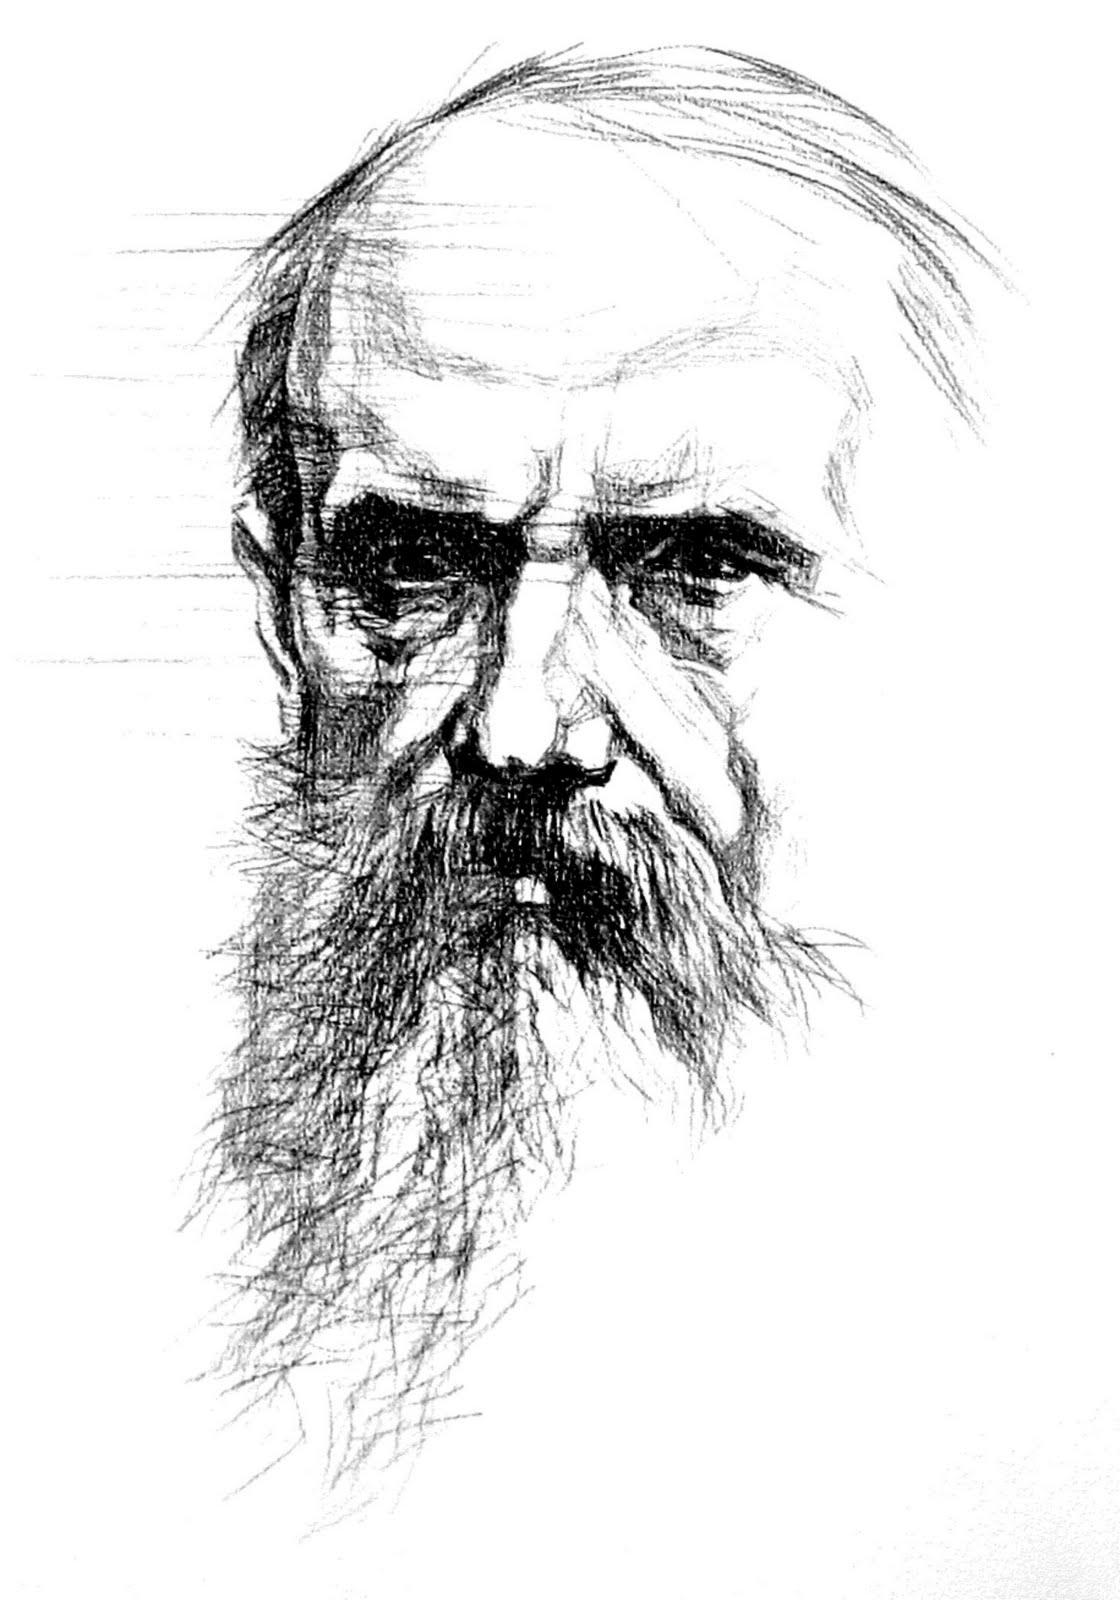 kharshak_dostoevsky_1